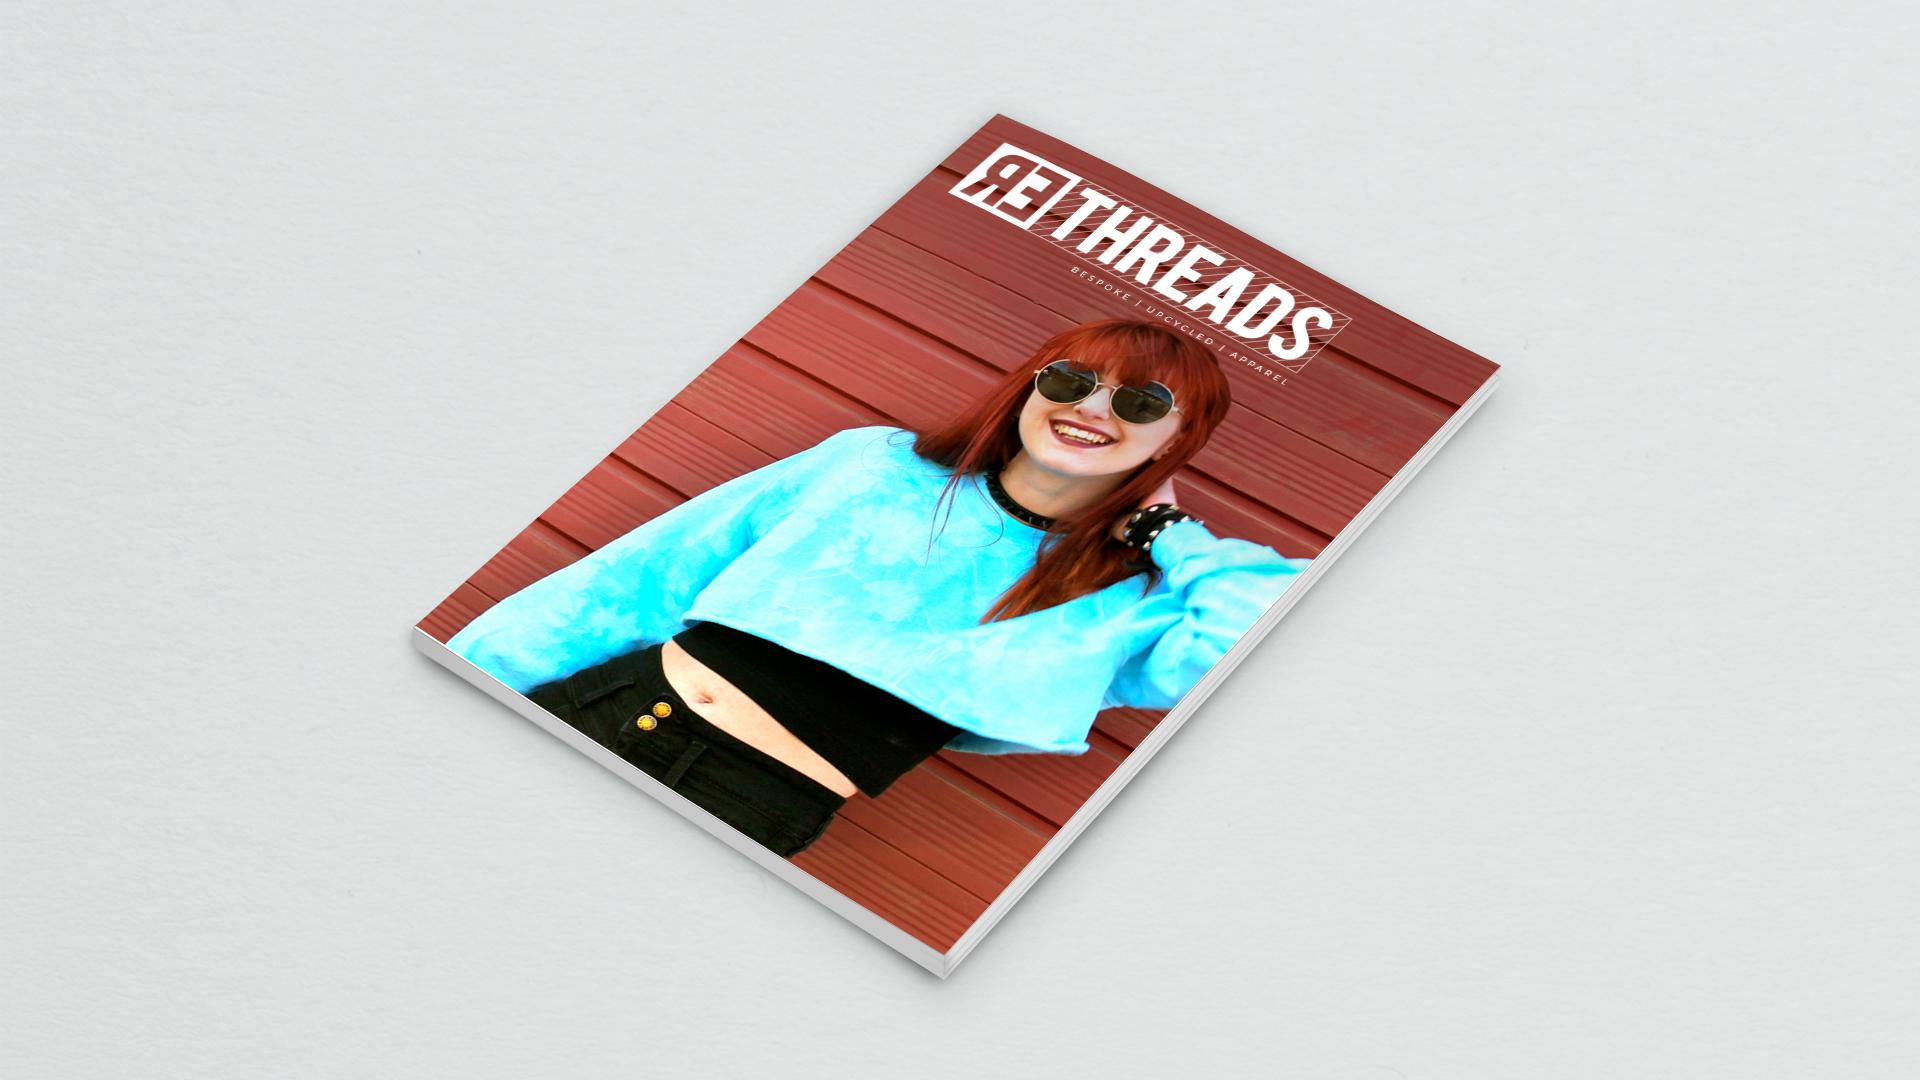 Rethreads1